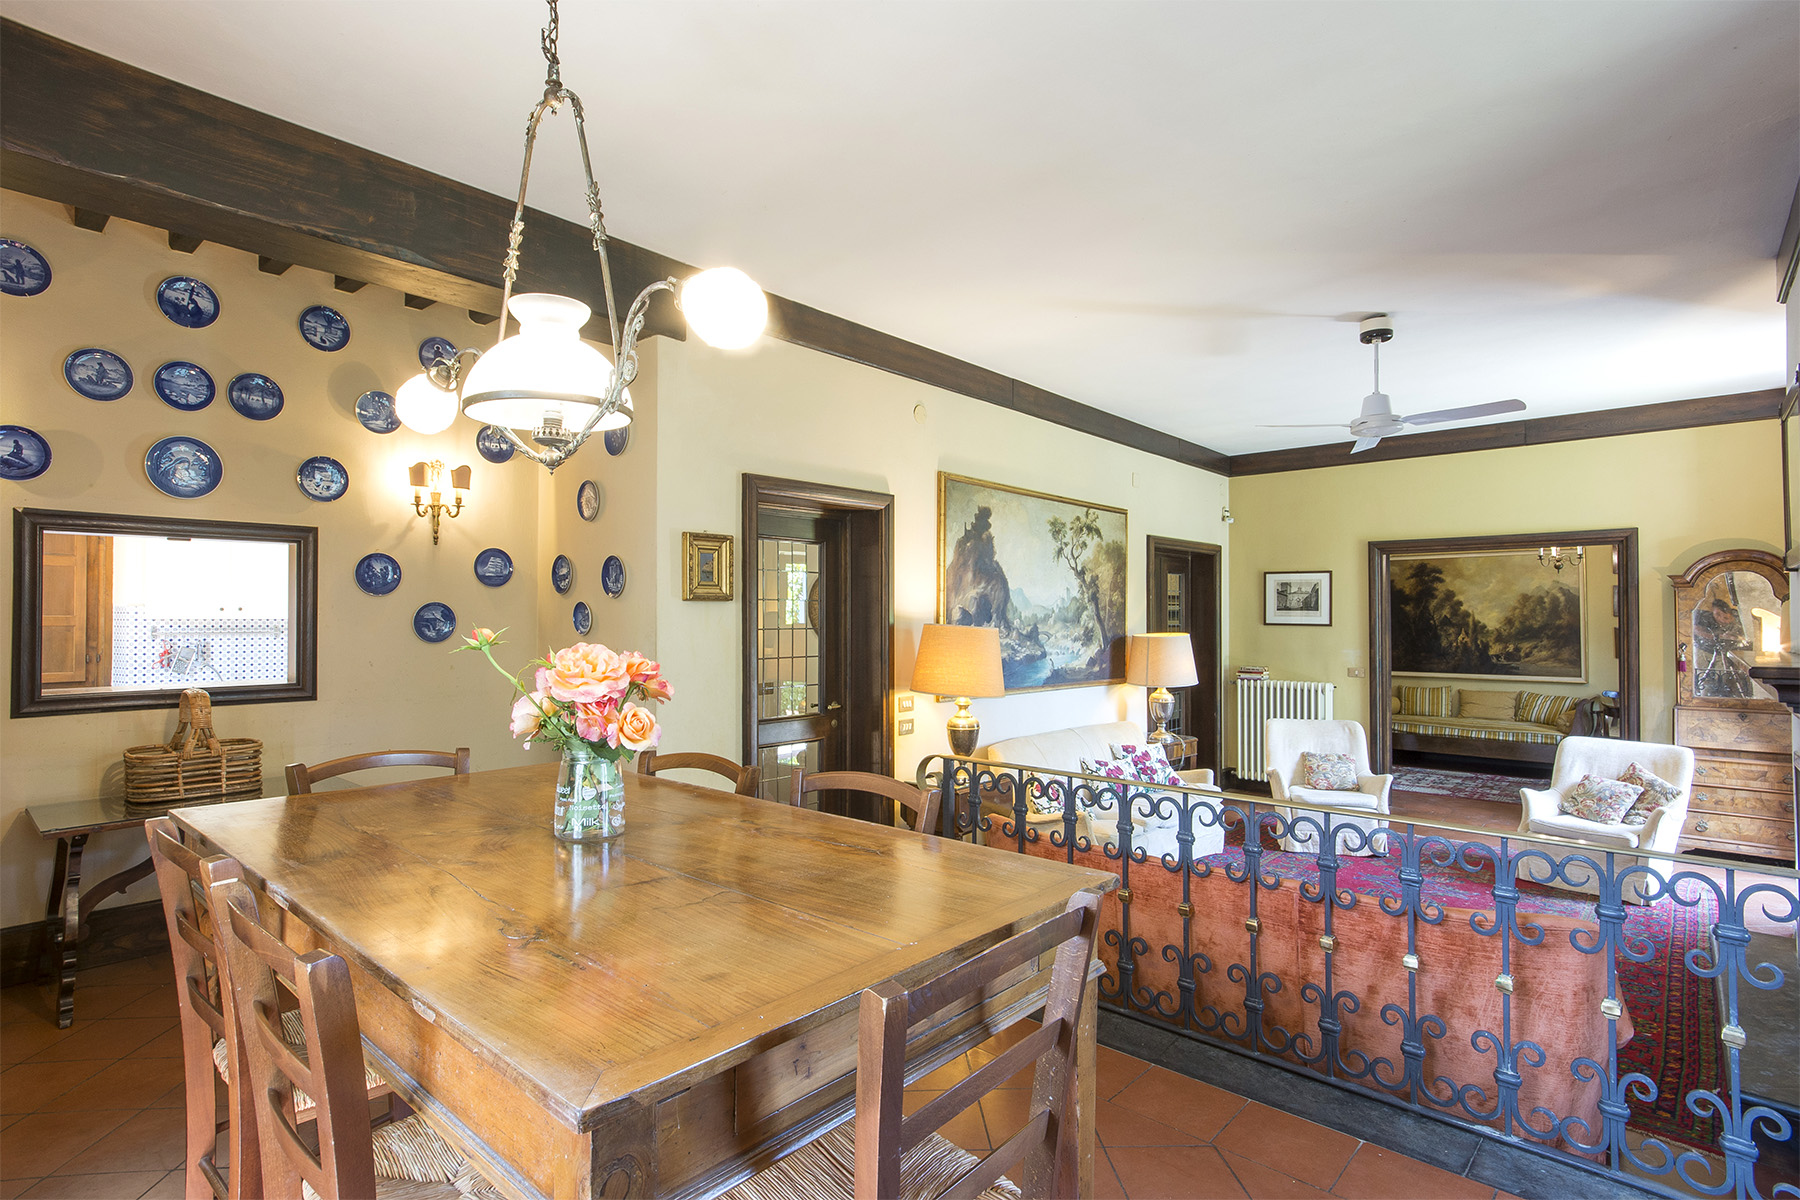 Villa in Vendita a Lucca: 5 locali, 600 mq - Foto 15